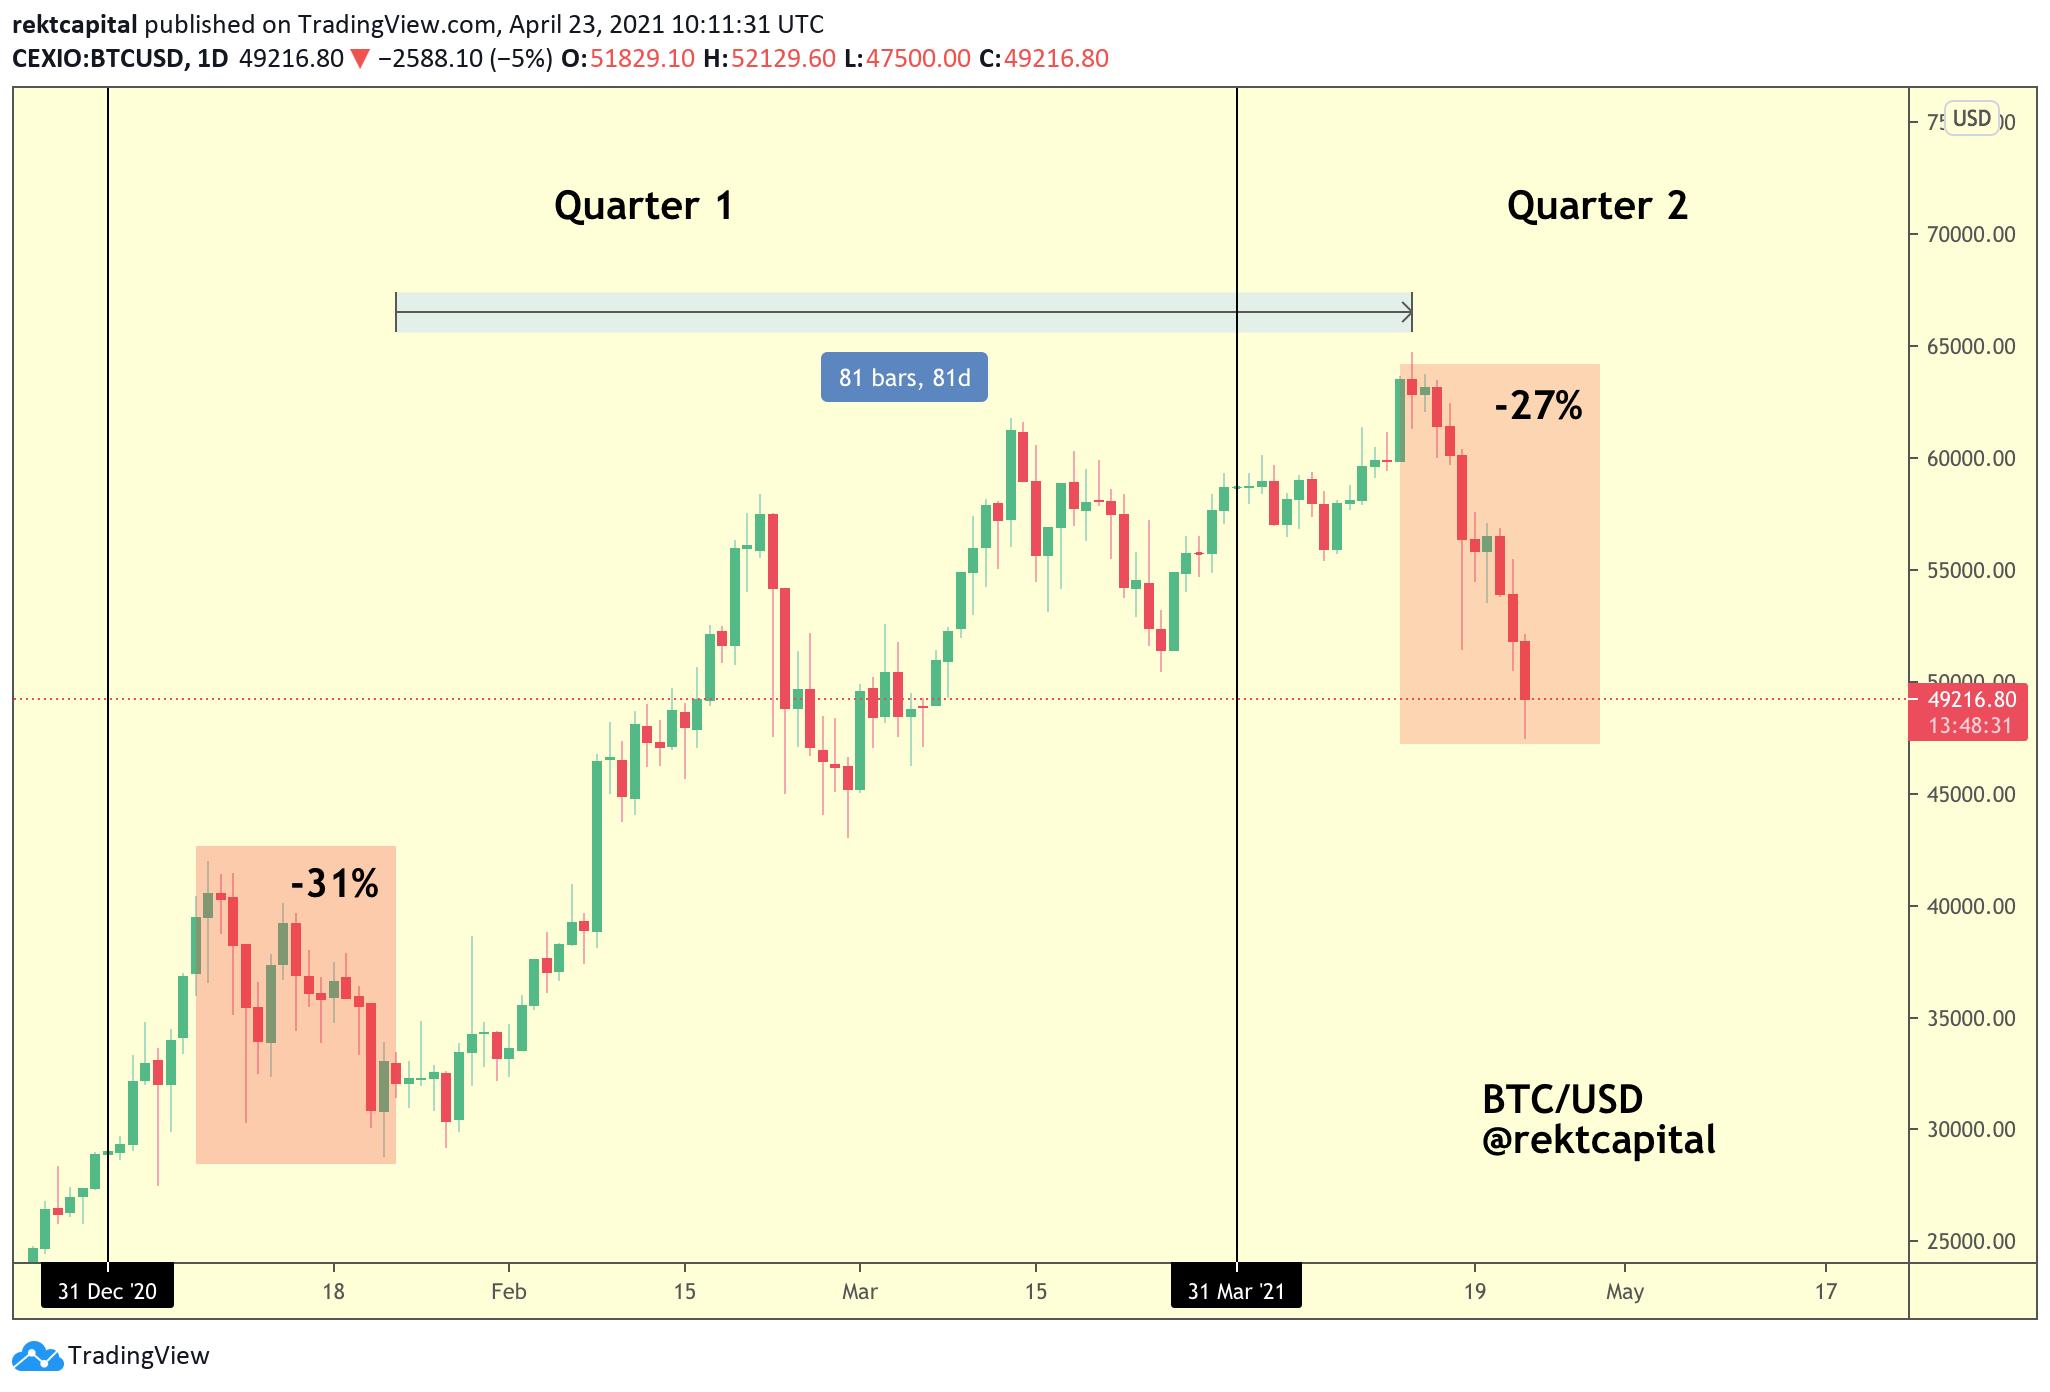 BTC/USD Q1 and Q2 pullback comparison